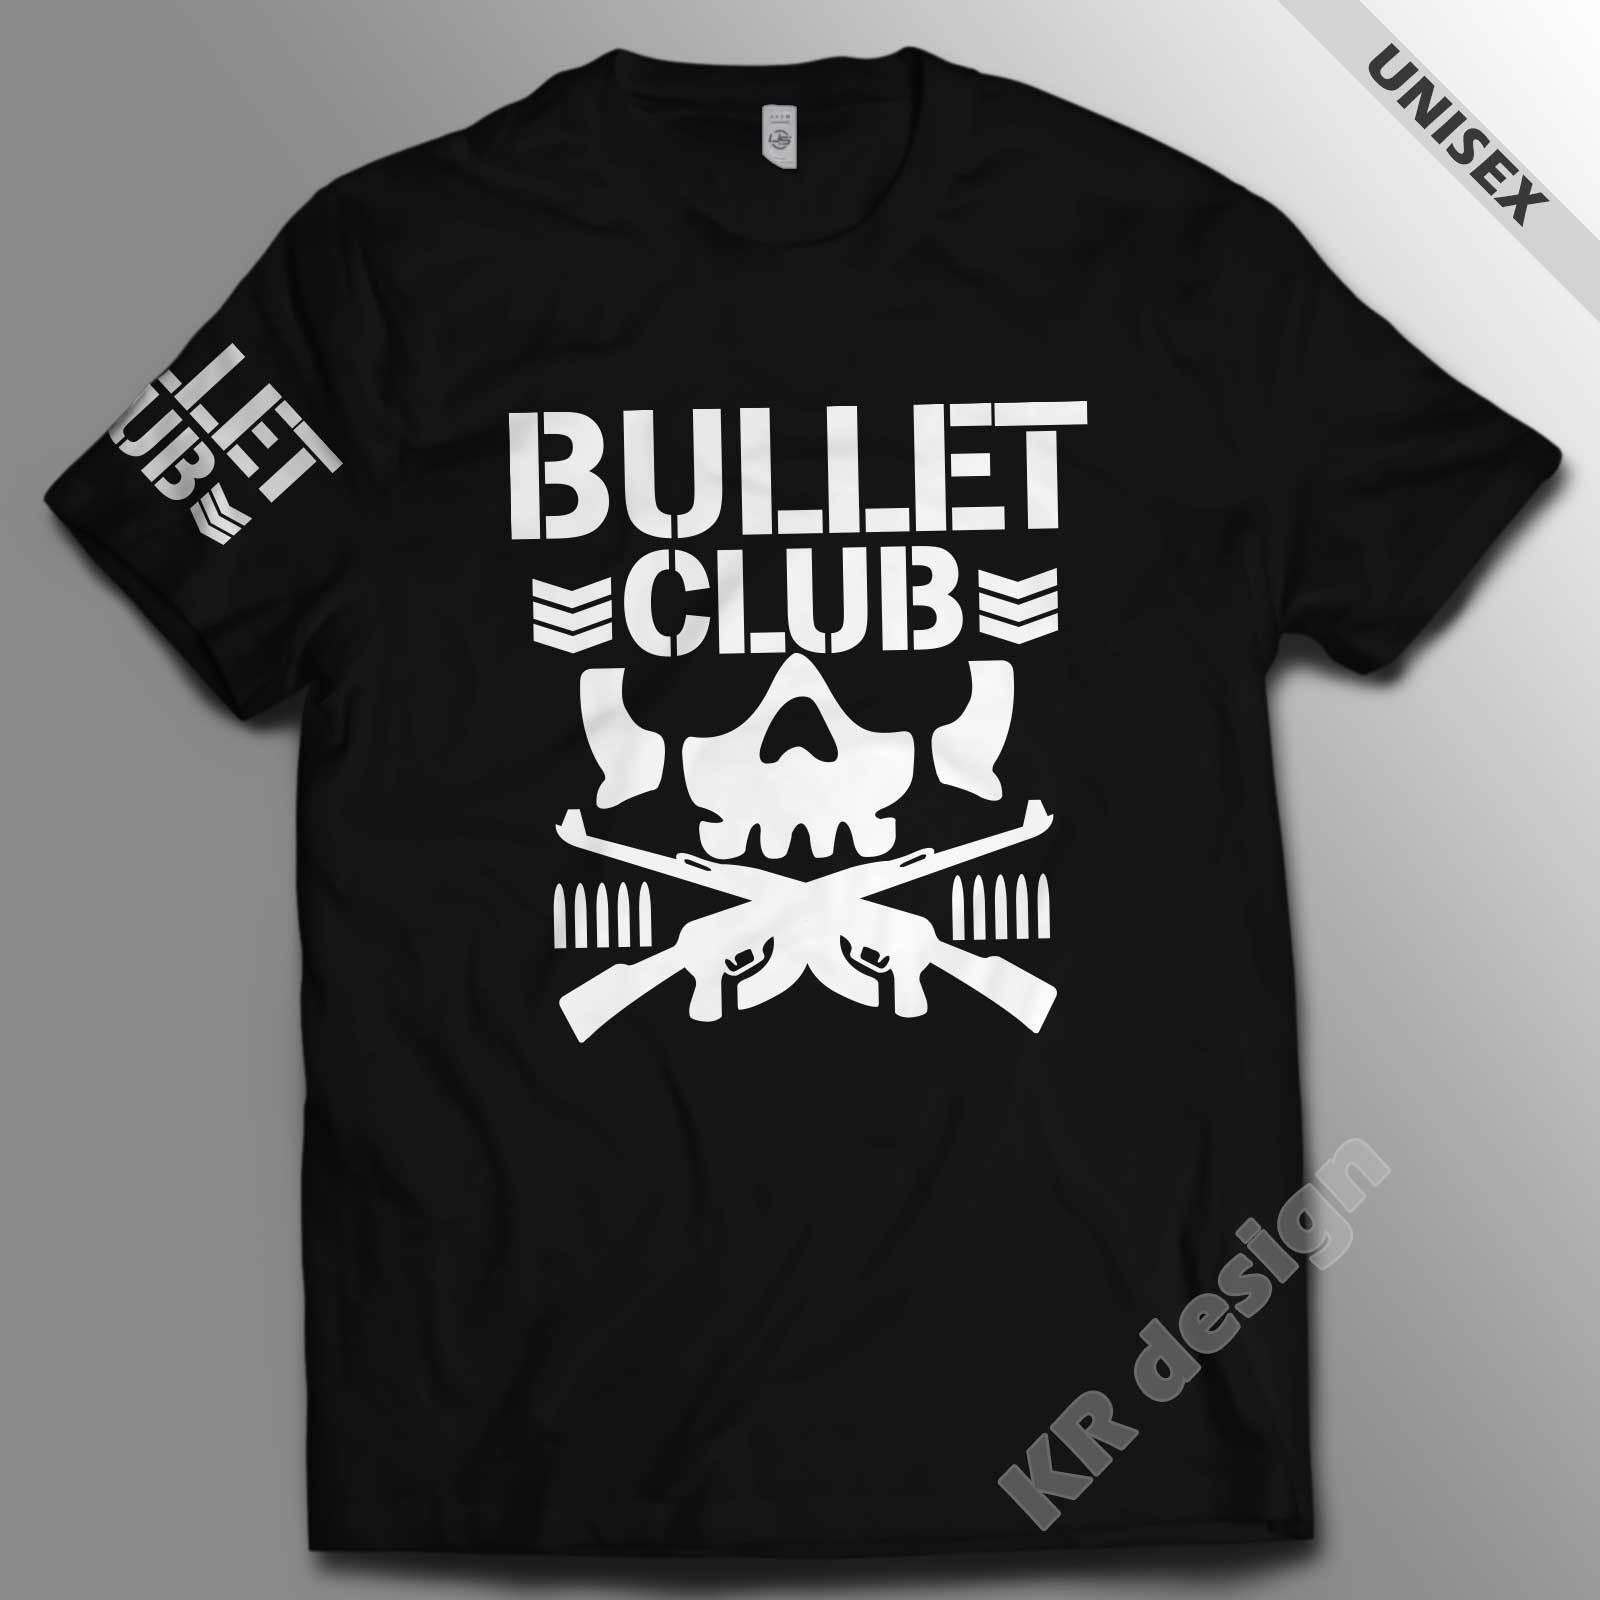 New Japan Pro Wrestling Bullet Club T-shirt Bone WWE Soldier NJPW UFC Unisex tee